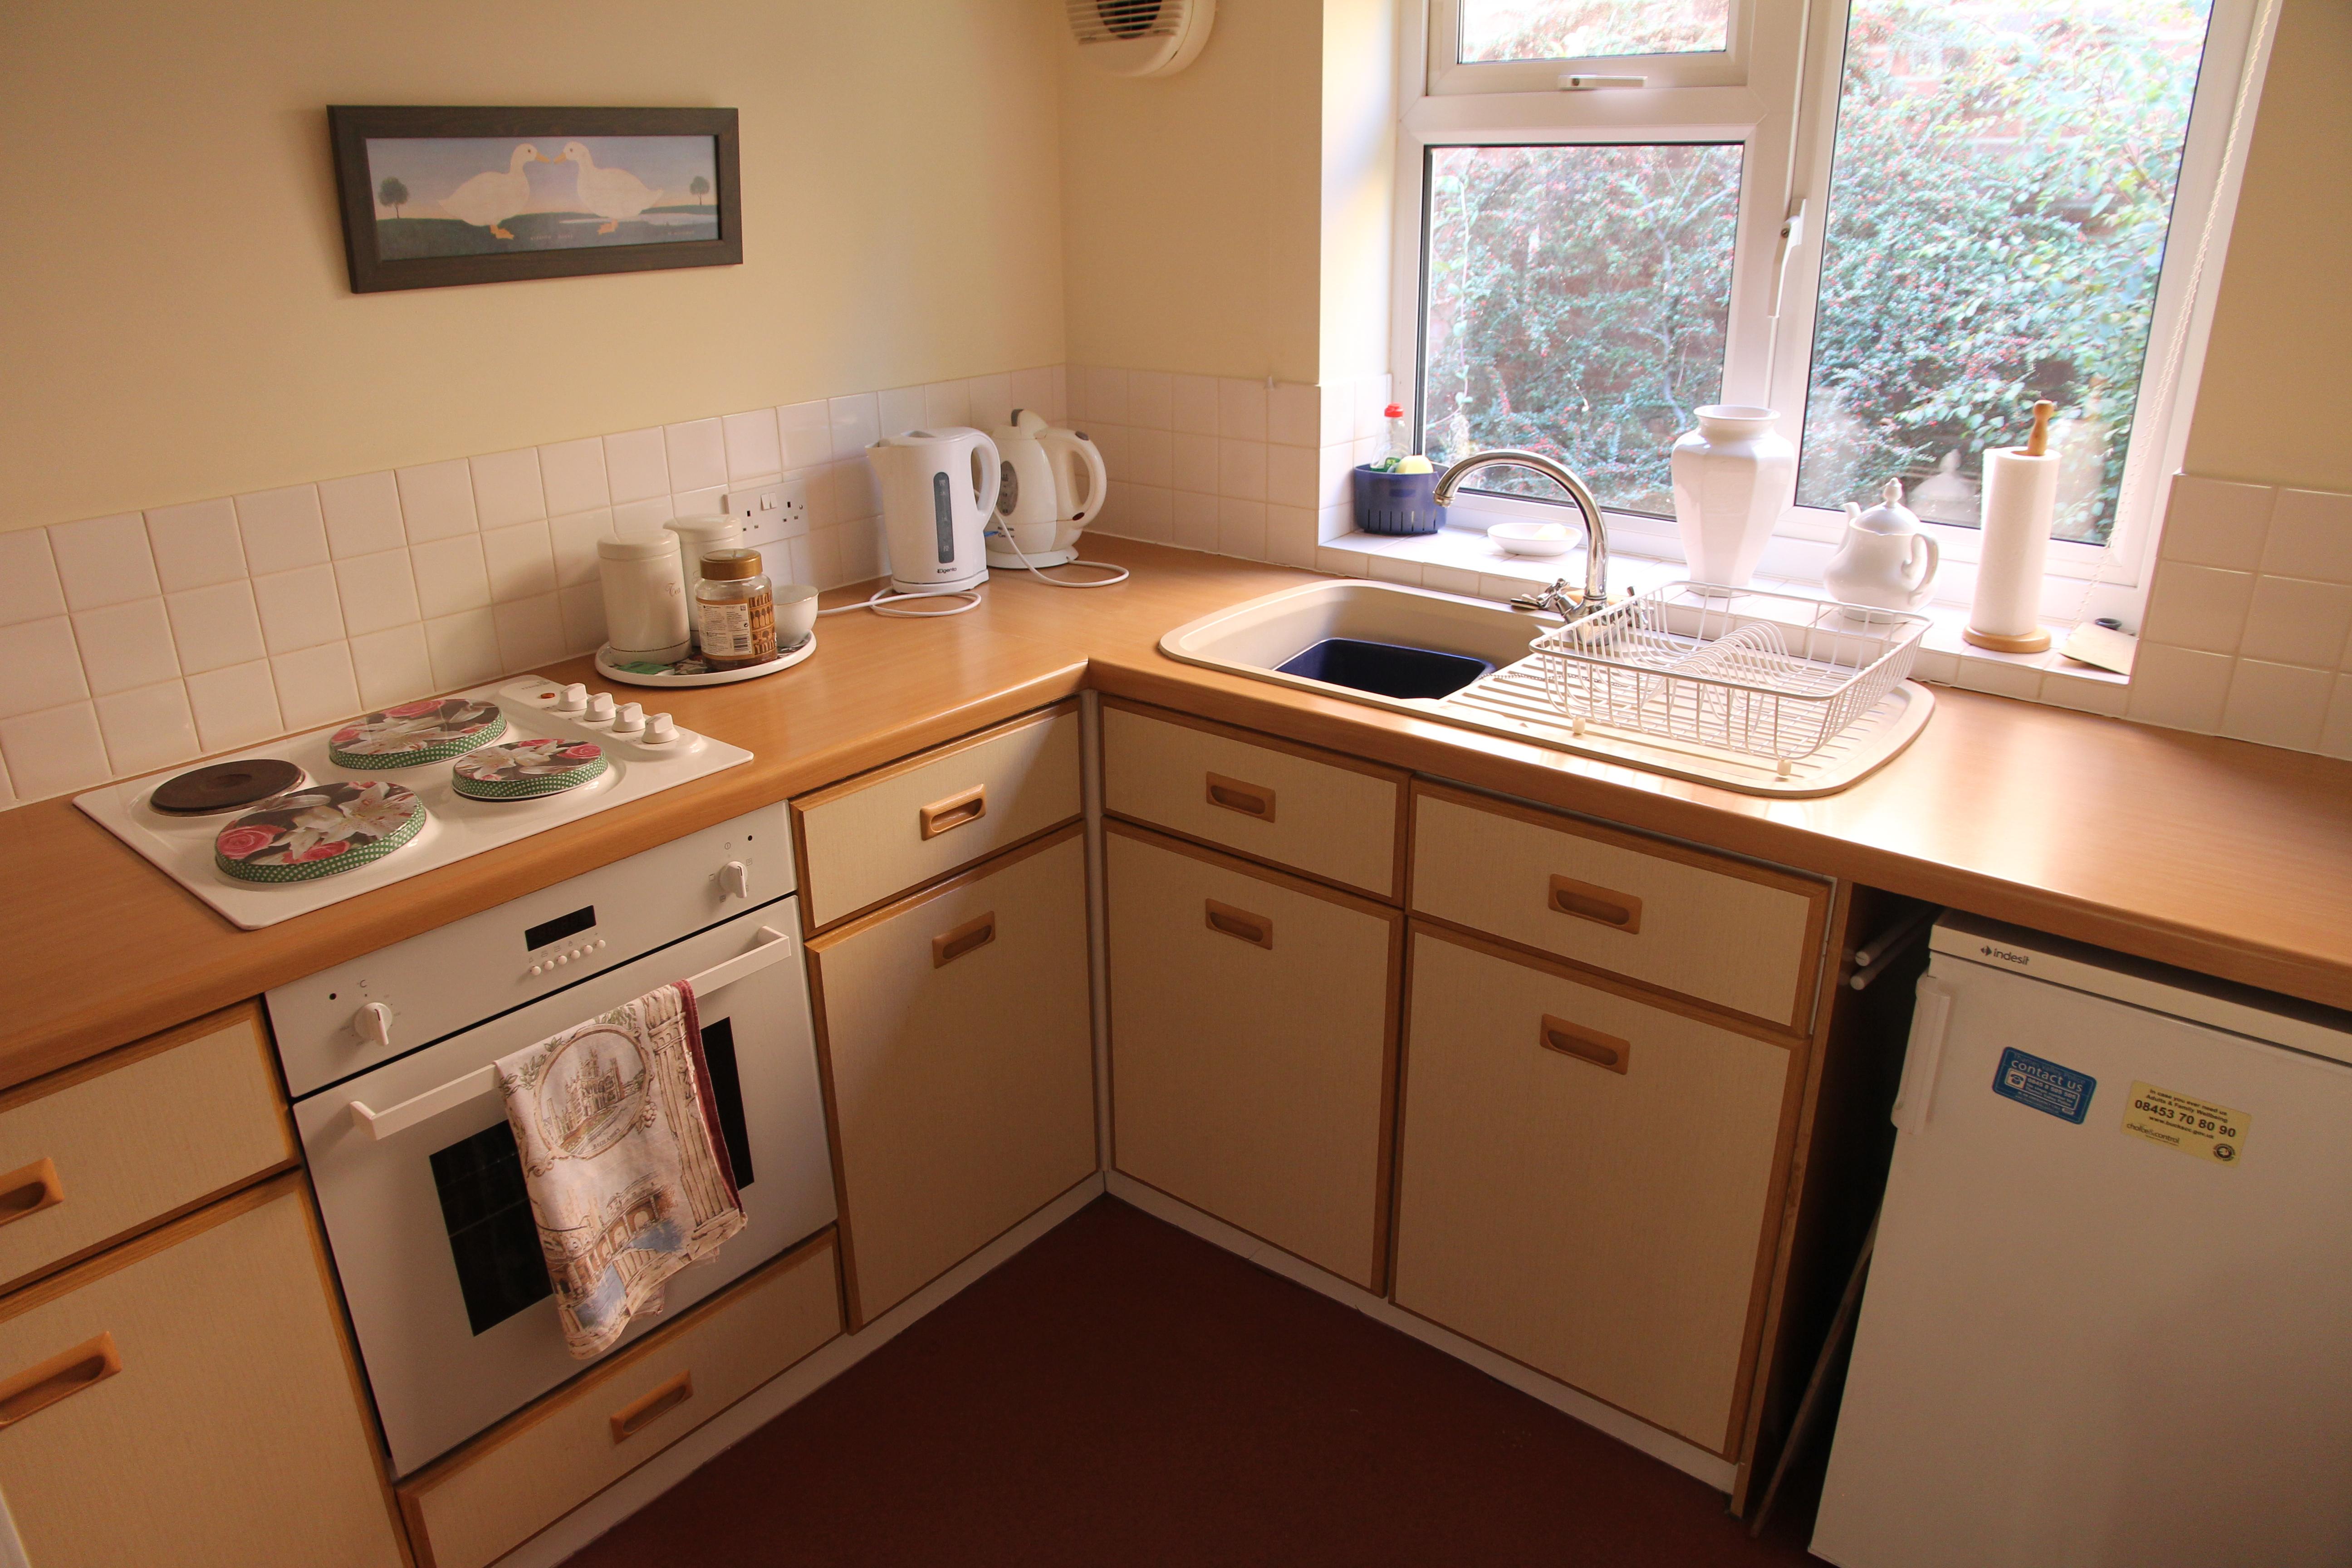 Kitchen in Community Room